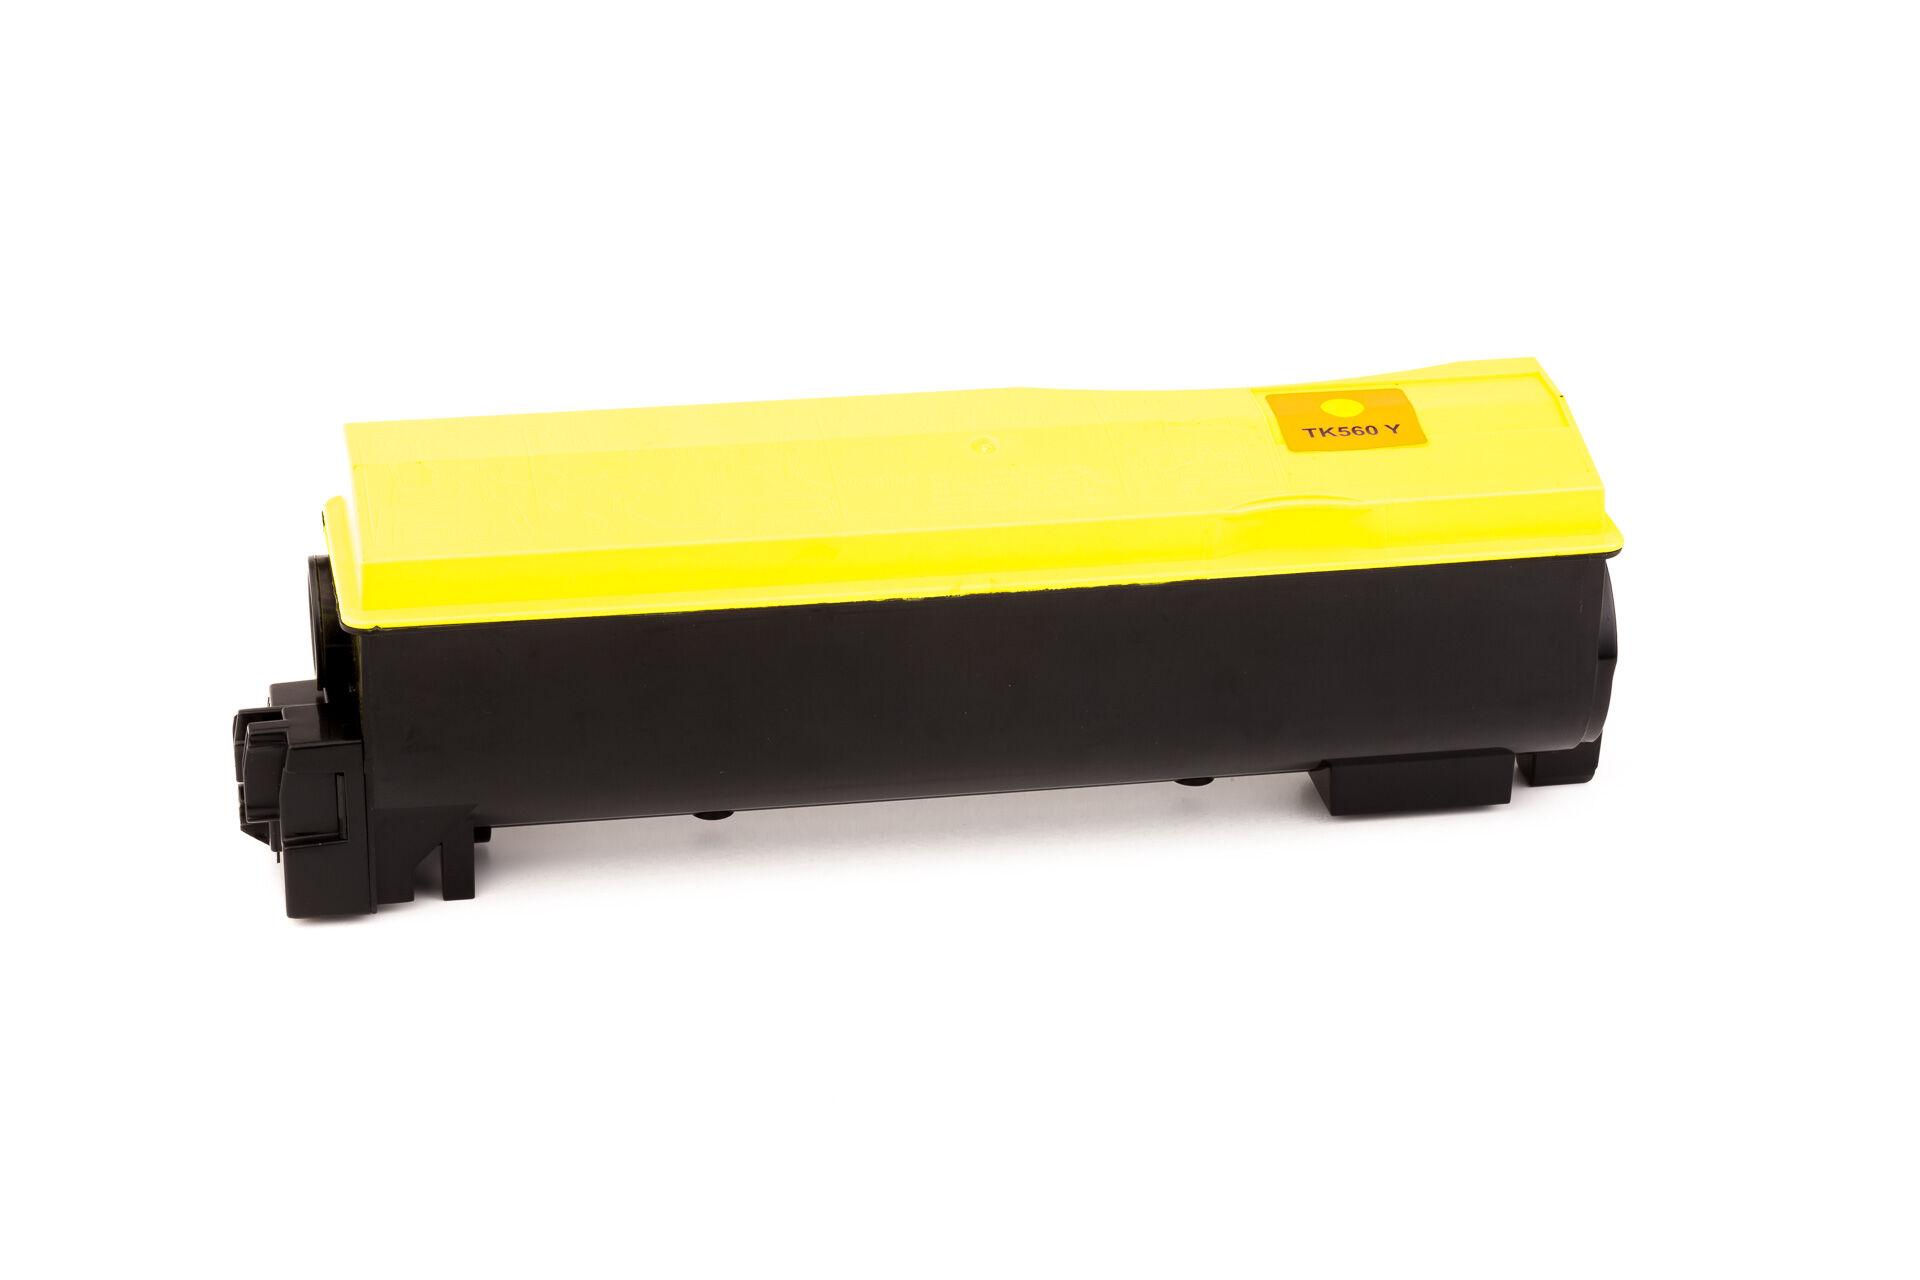 Kyocera Cartouche de Toner pour Kyocera 1T02HNBEU0 / TK-560 M magenta compatible (de marque ASC)